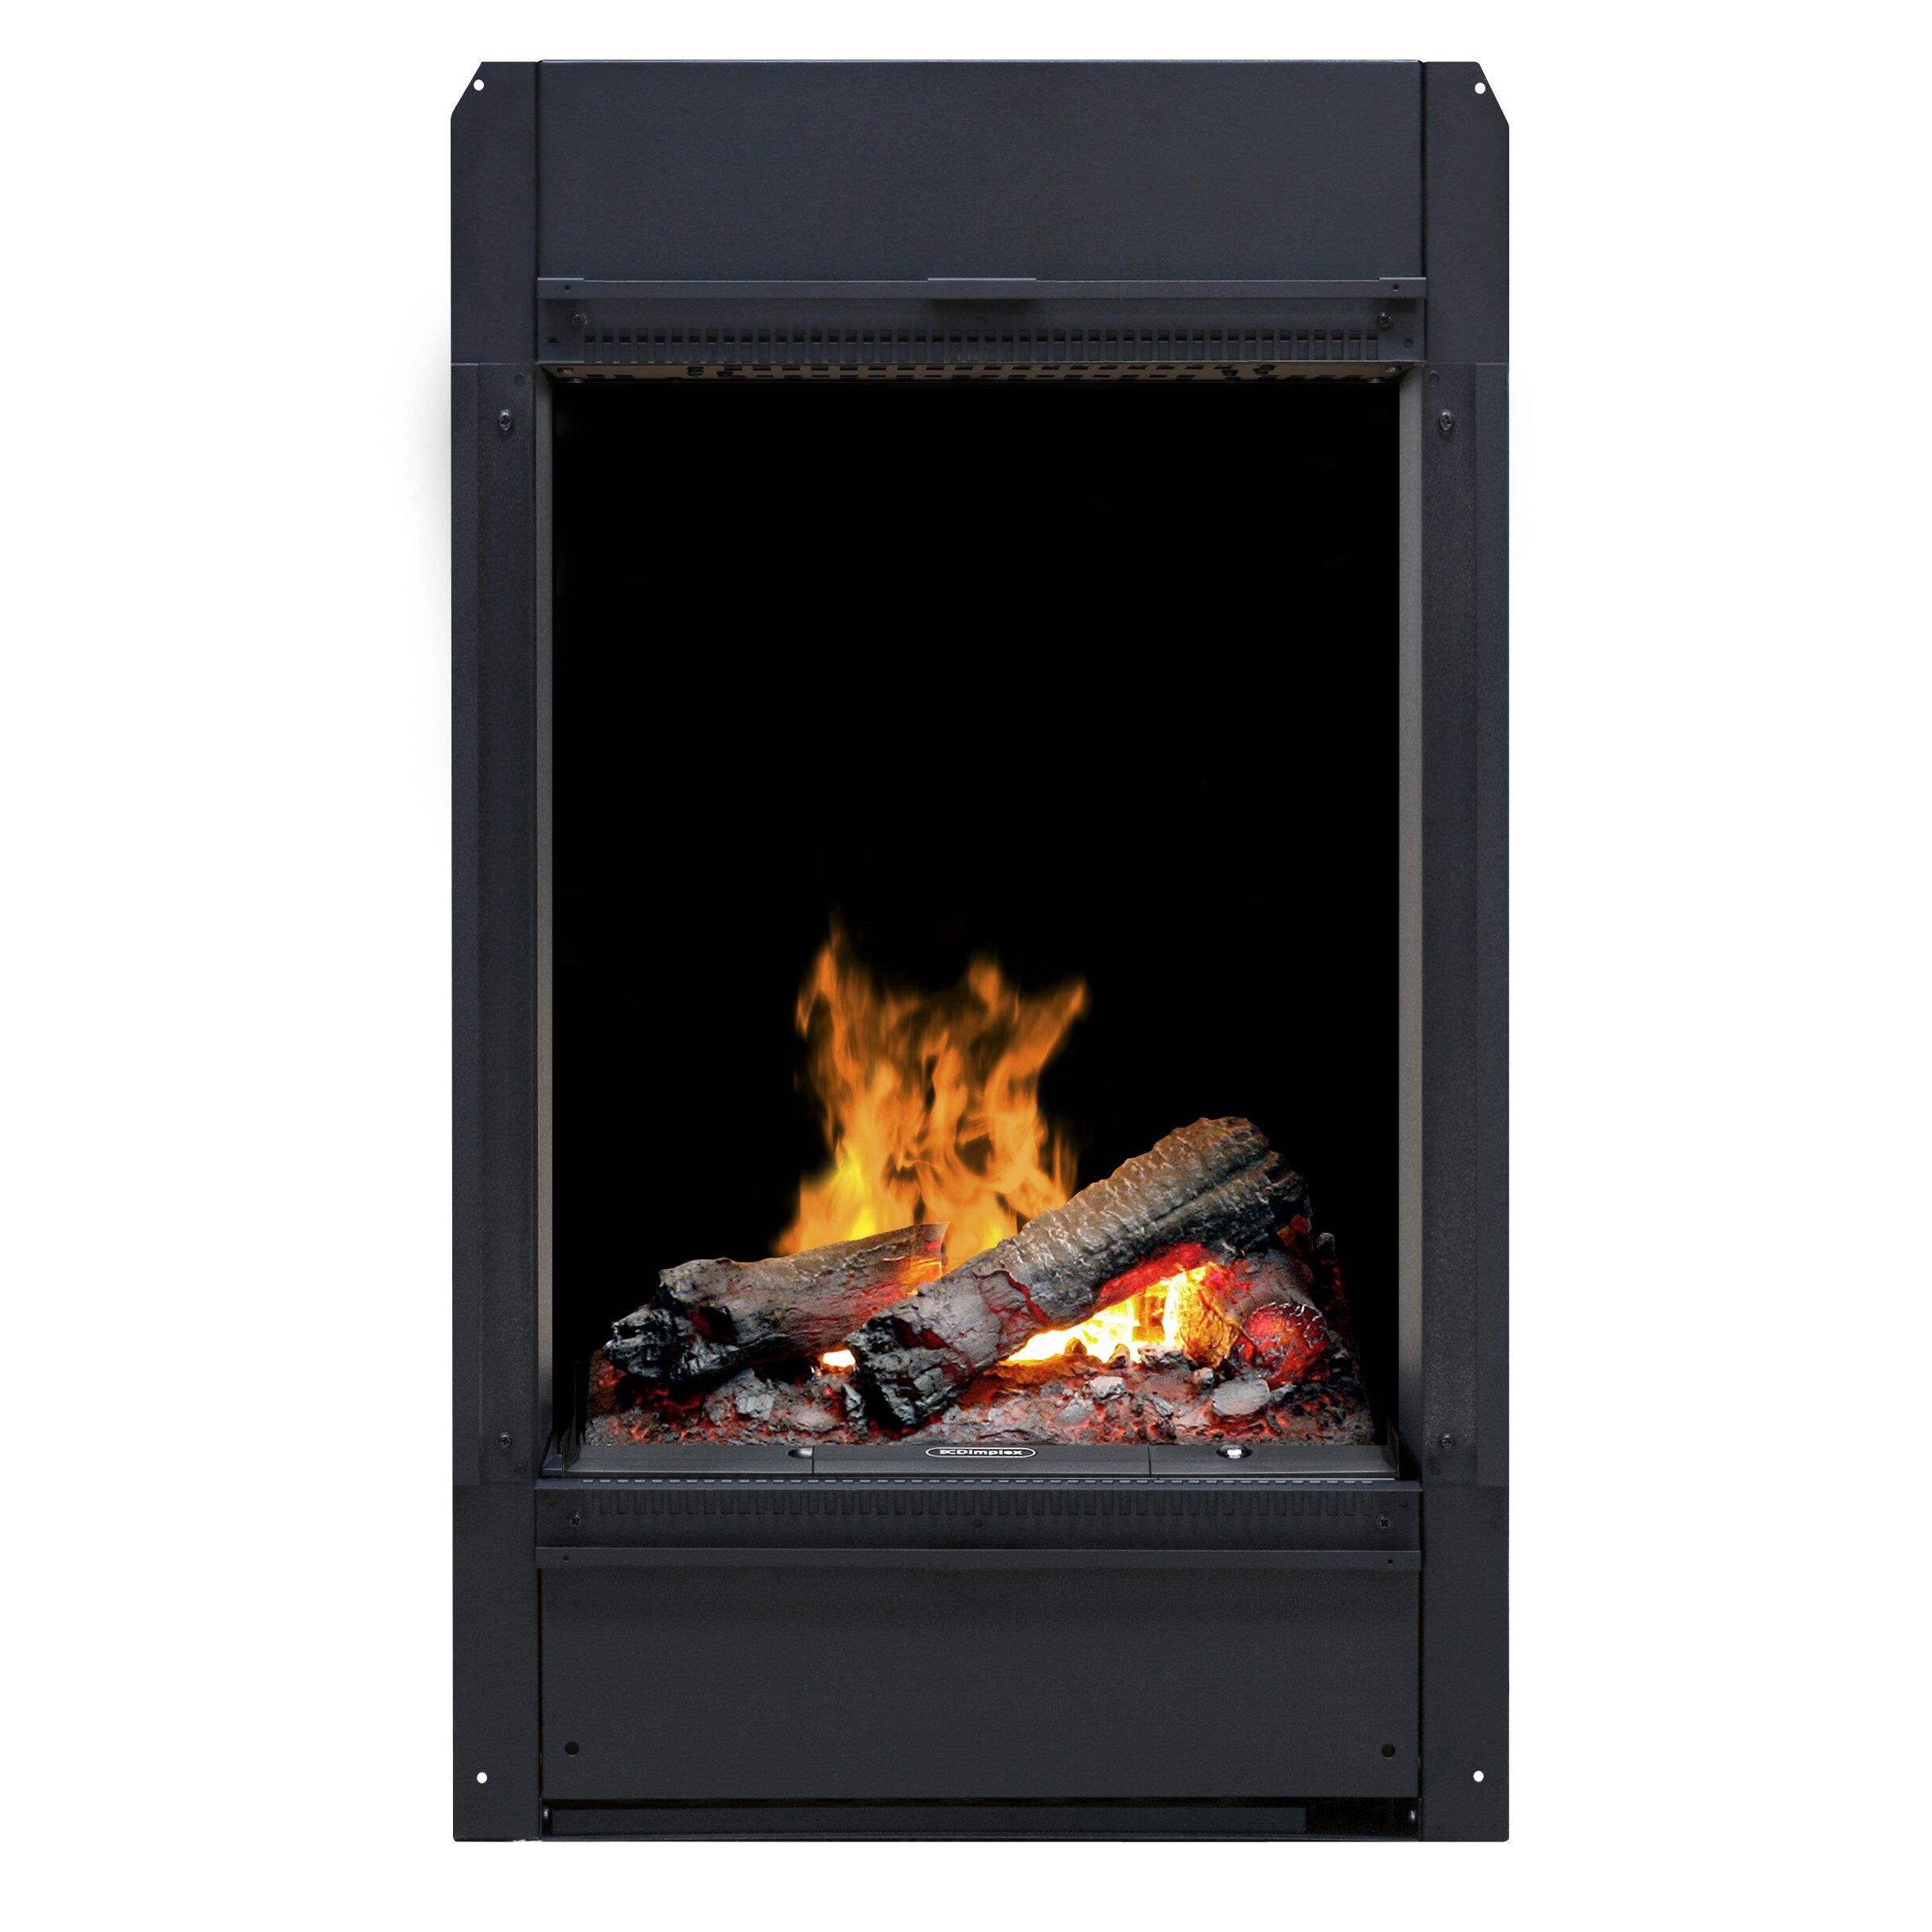 Dimplex Opti Myst Pro Wall Mount Electric Fireplace Wayfair